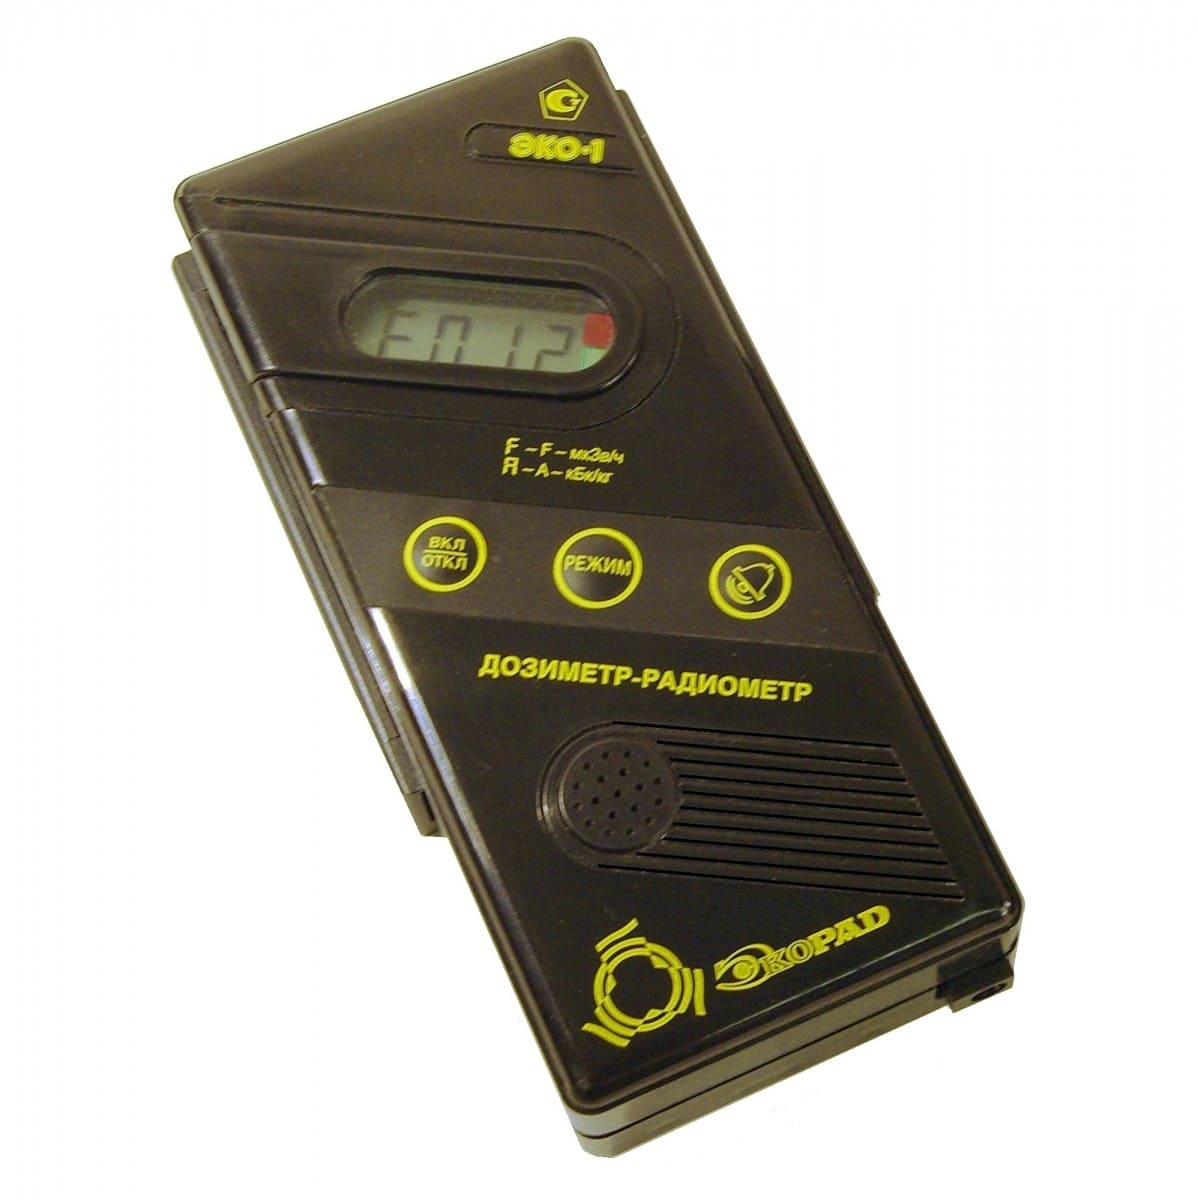 Дозиметр-радиометр ДРГБ-01 ЭКО-1М